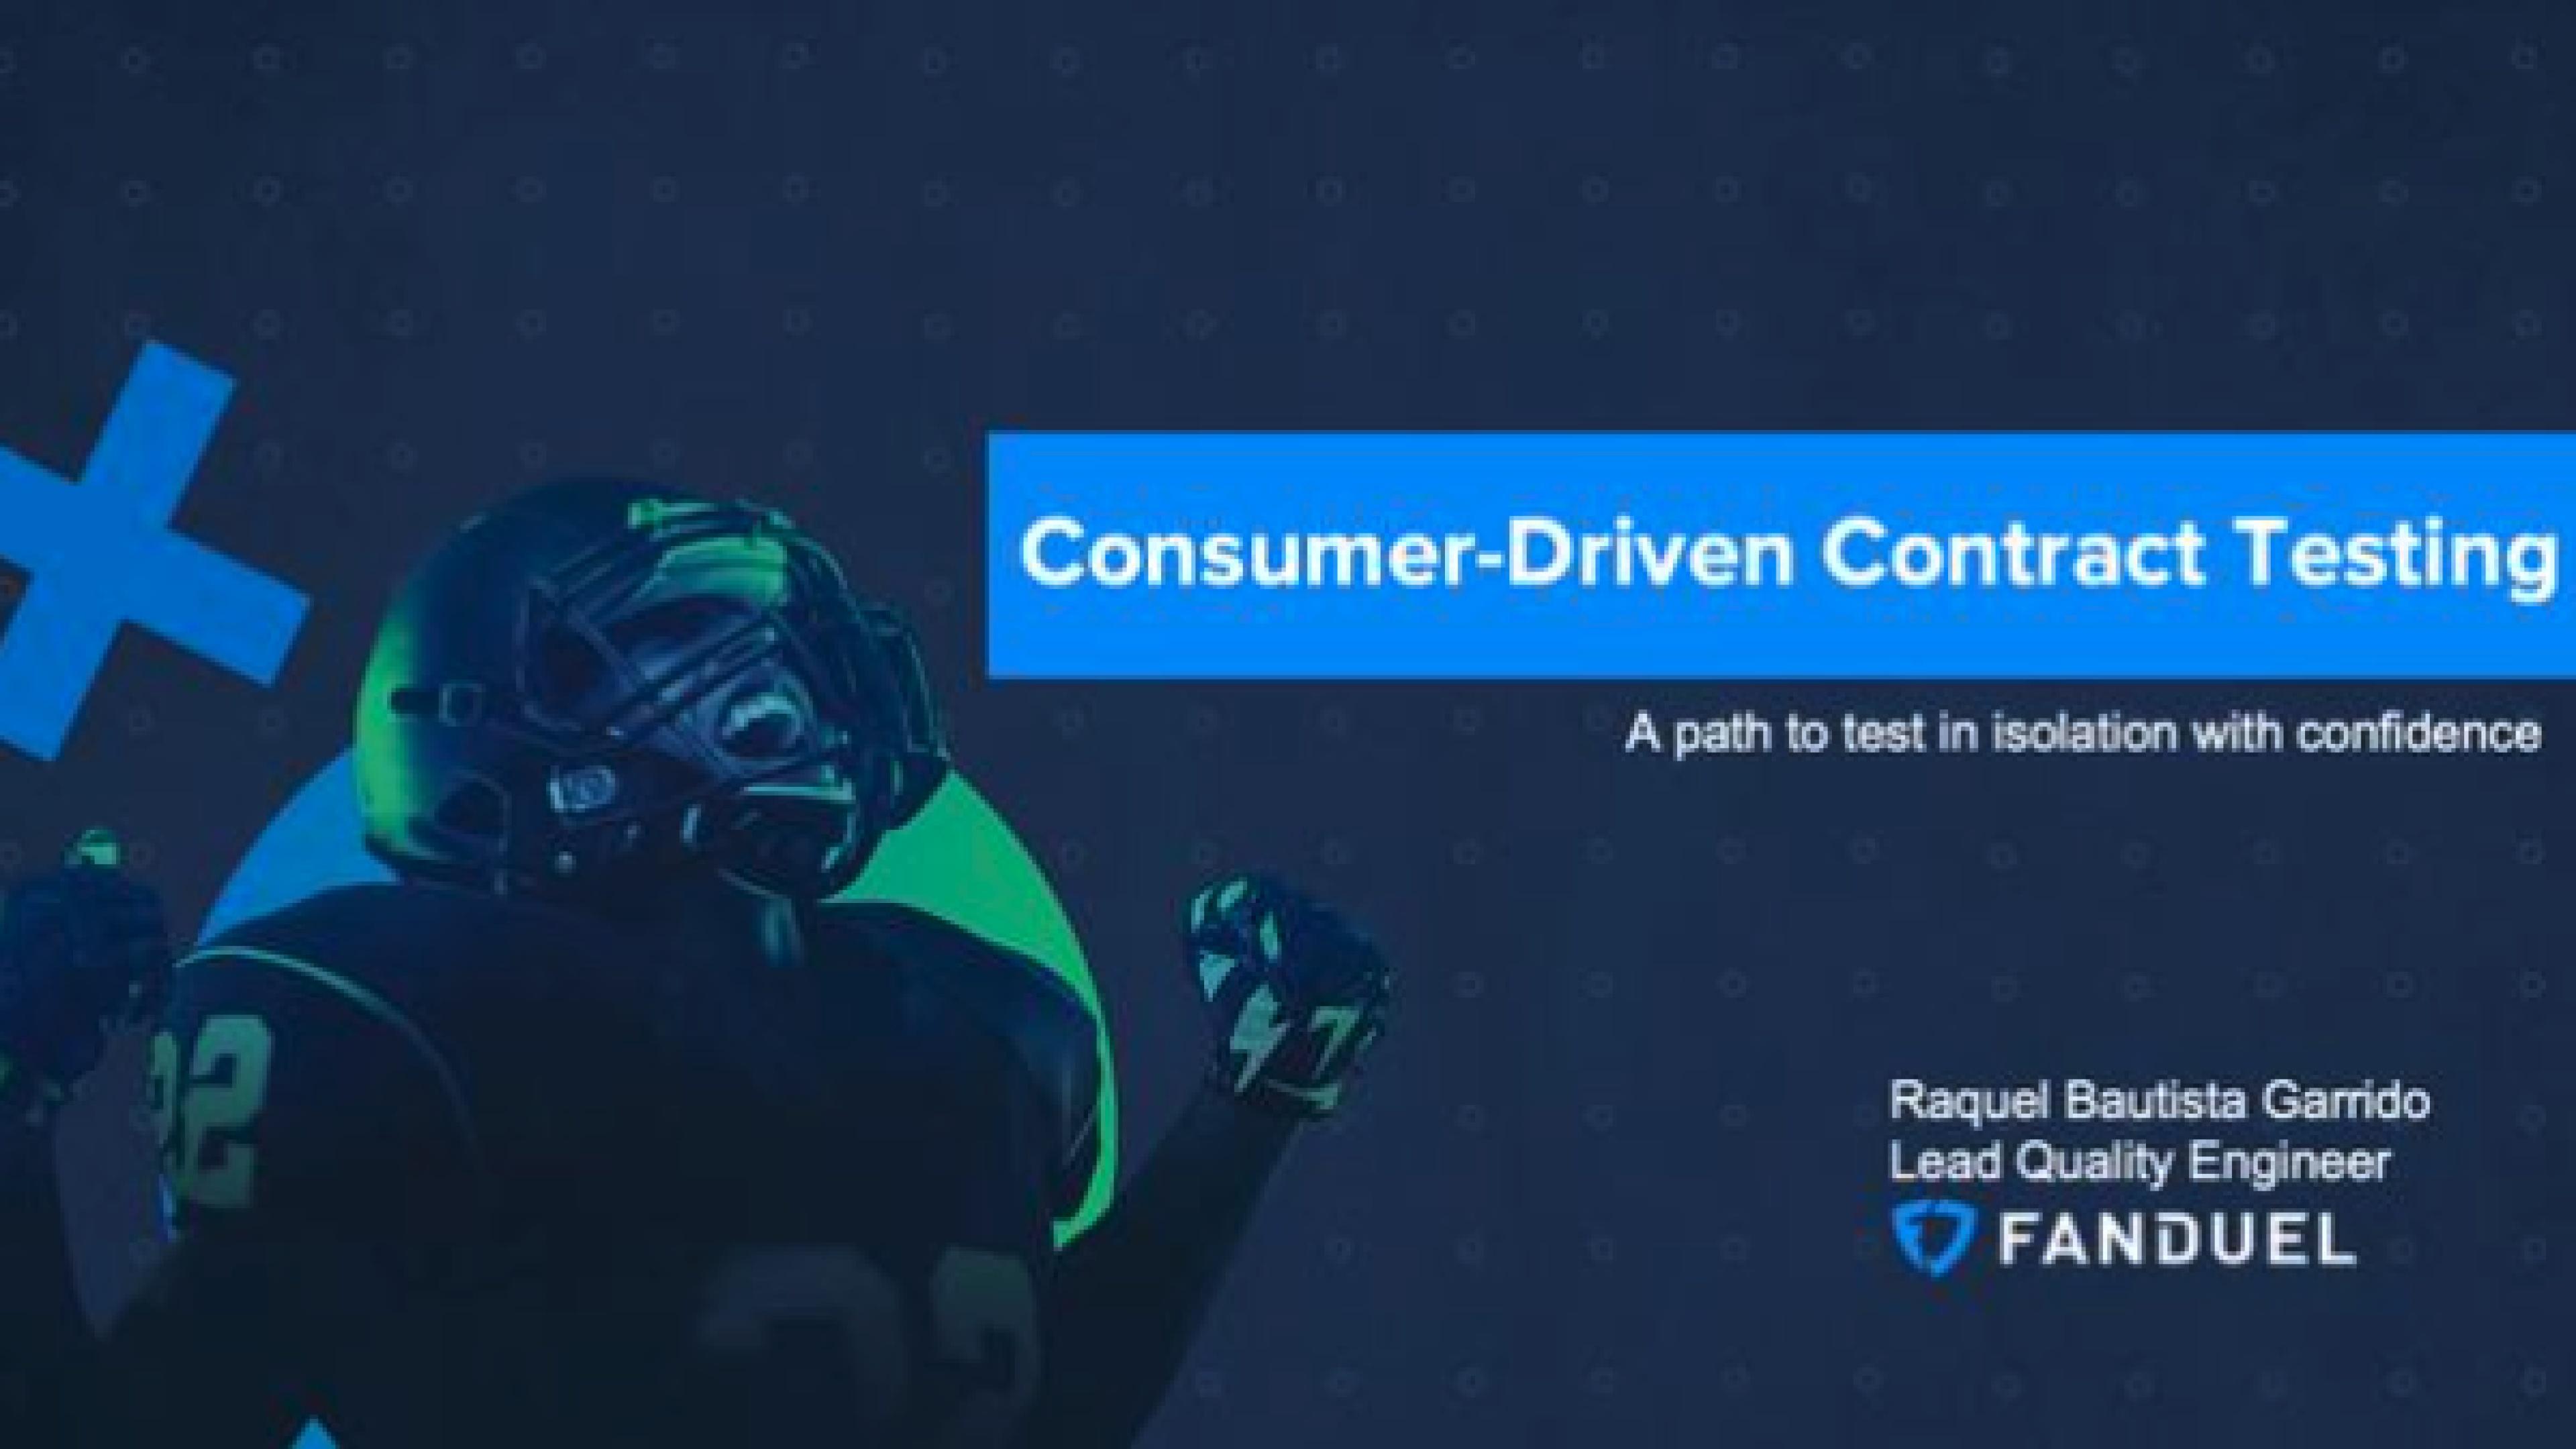 Consumer Driven Contract Testing - Raquel Bautista-Garrido